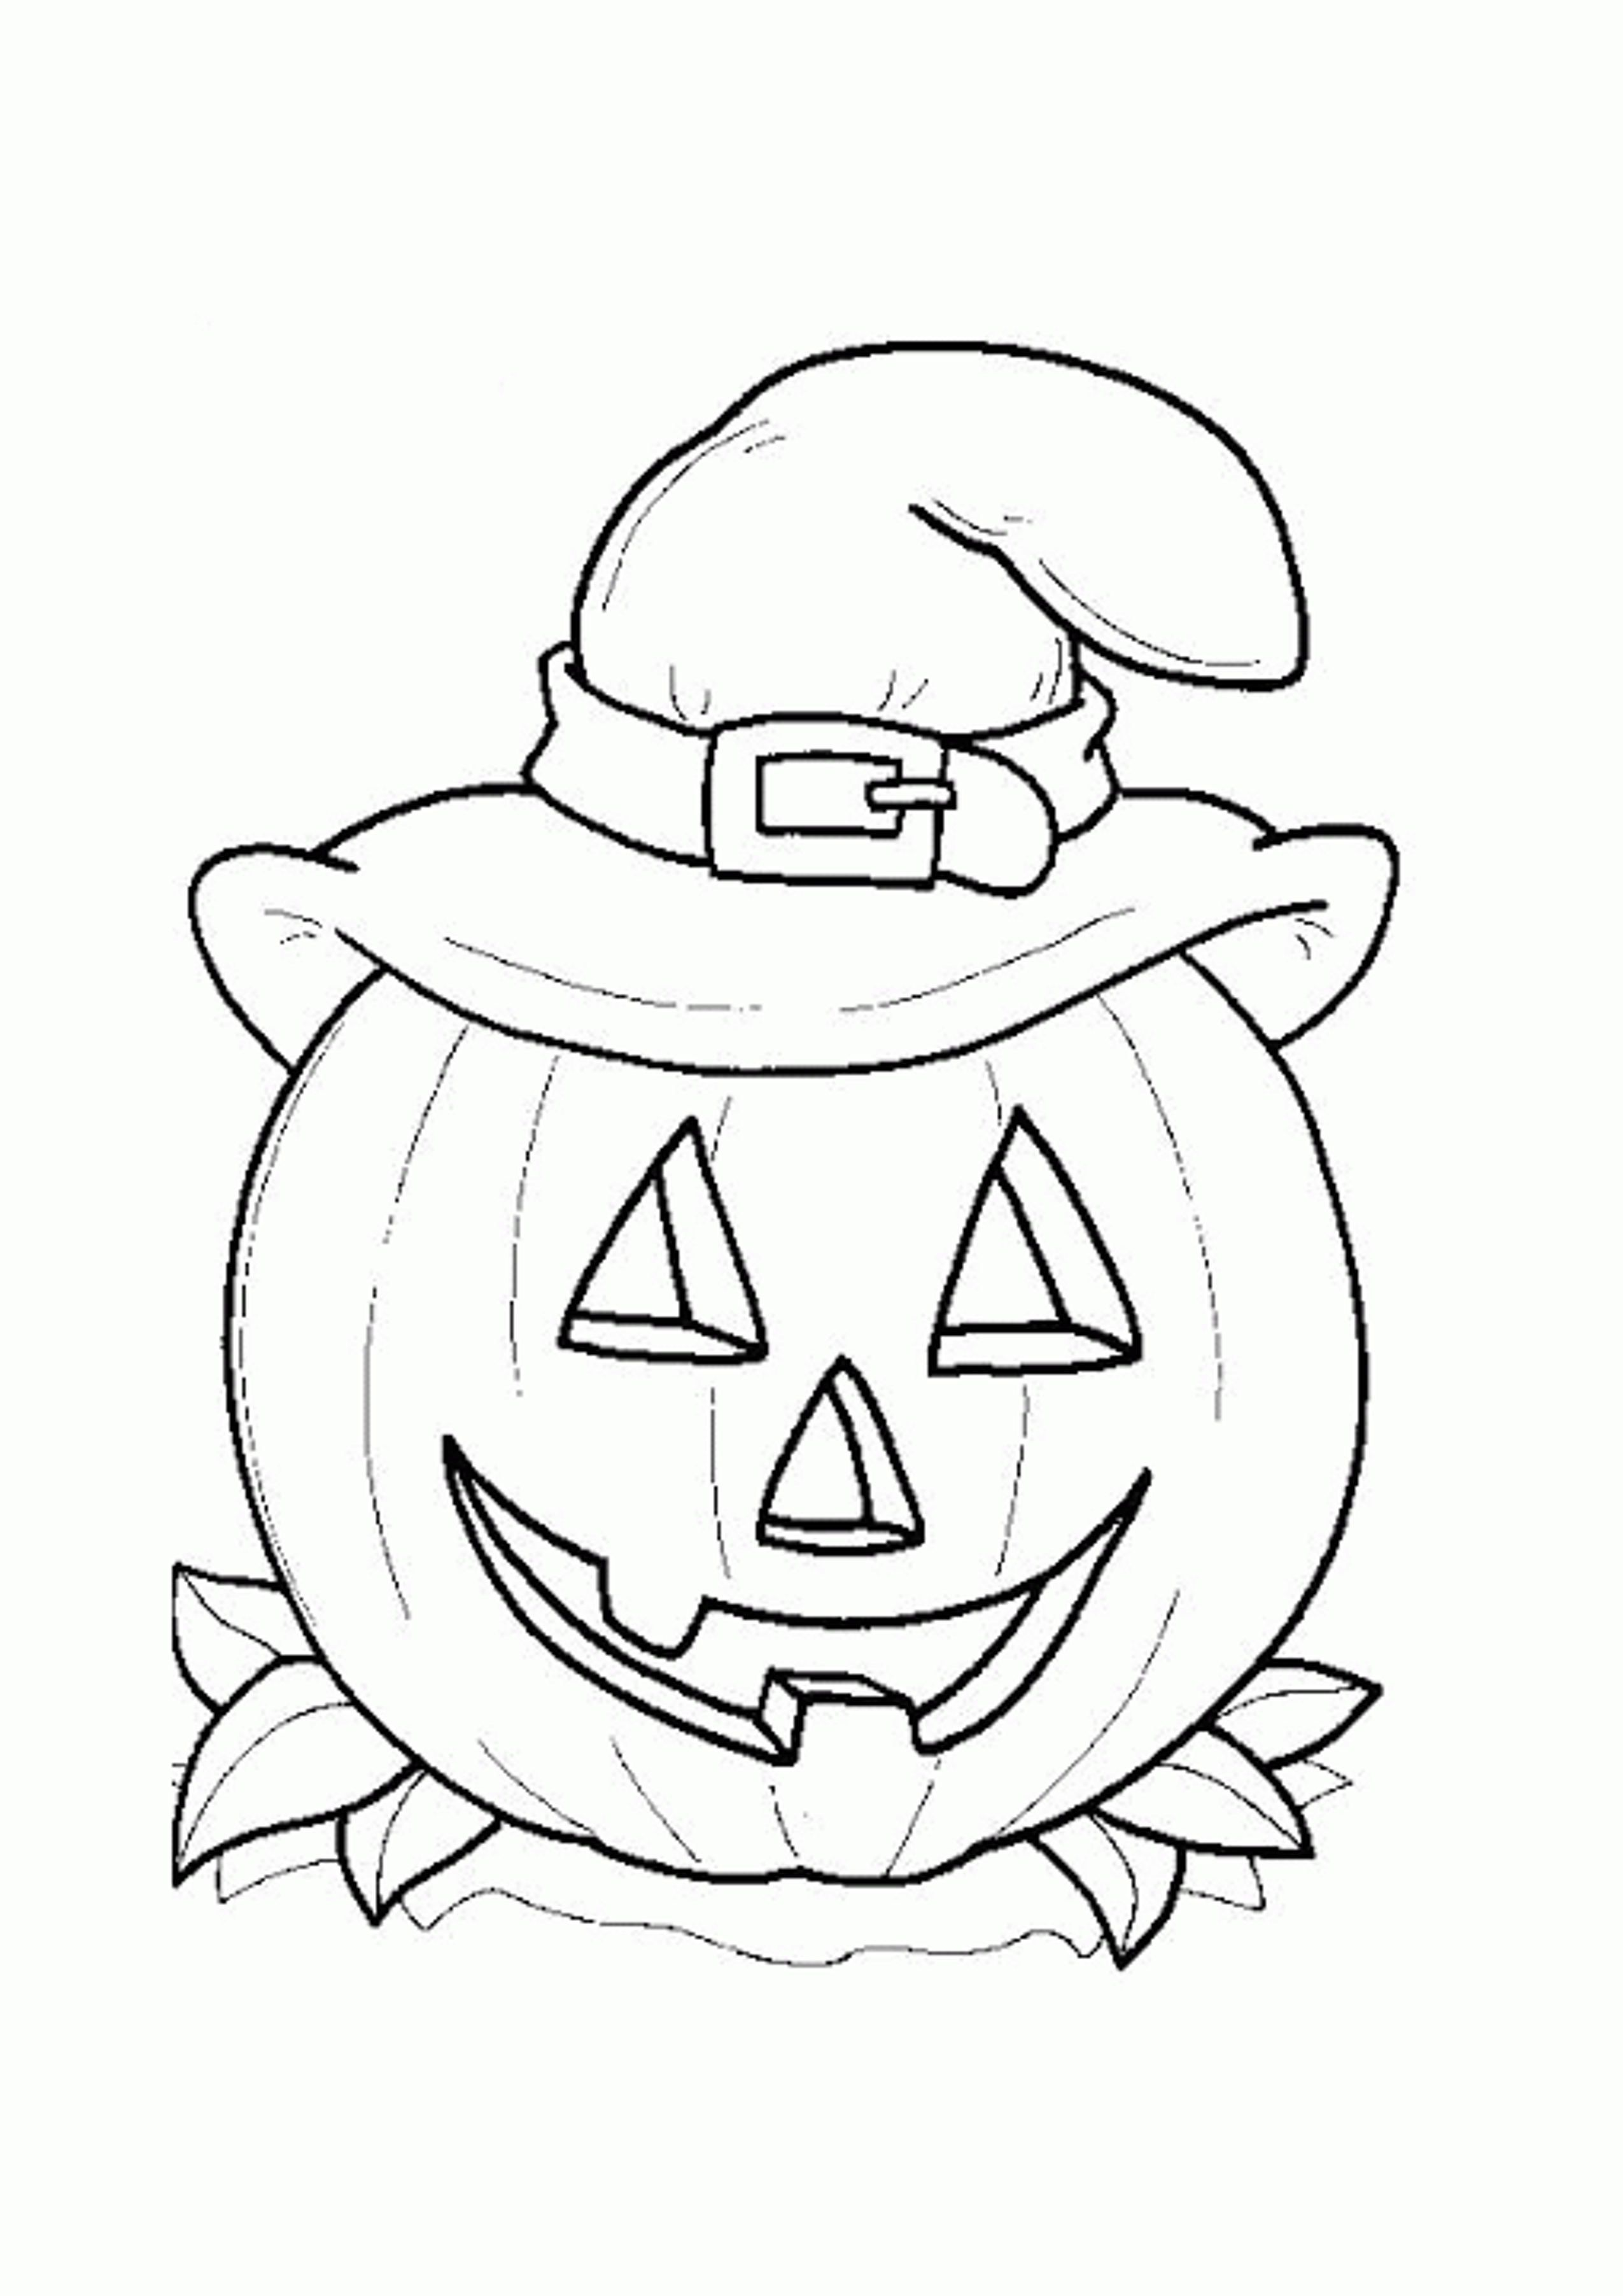 Pumpkin Coloring Pages For Preschool